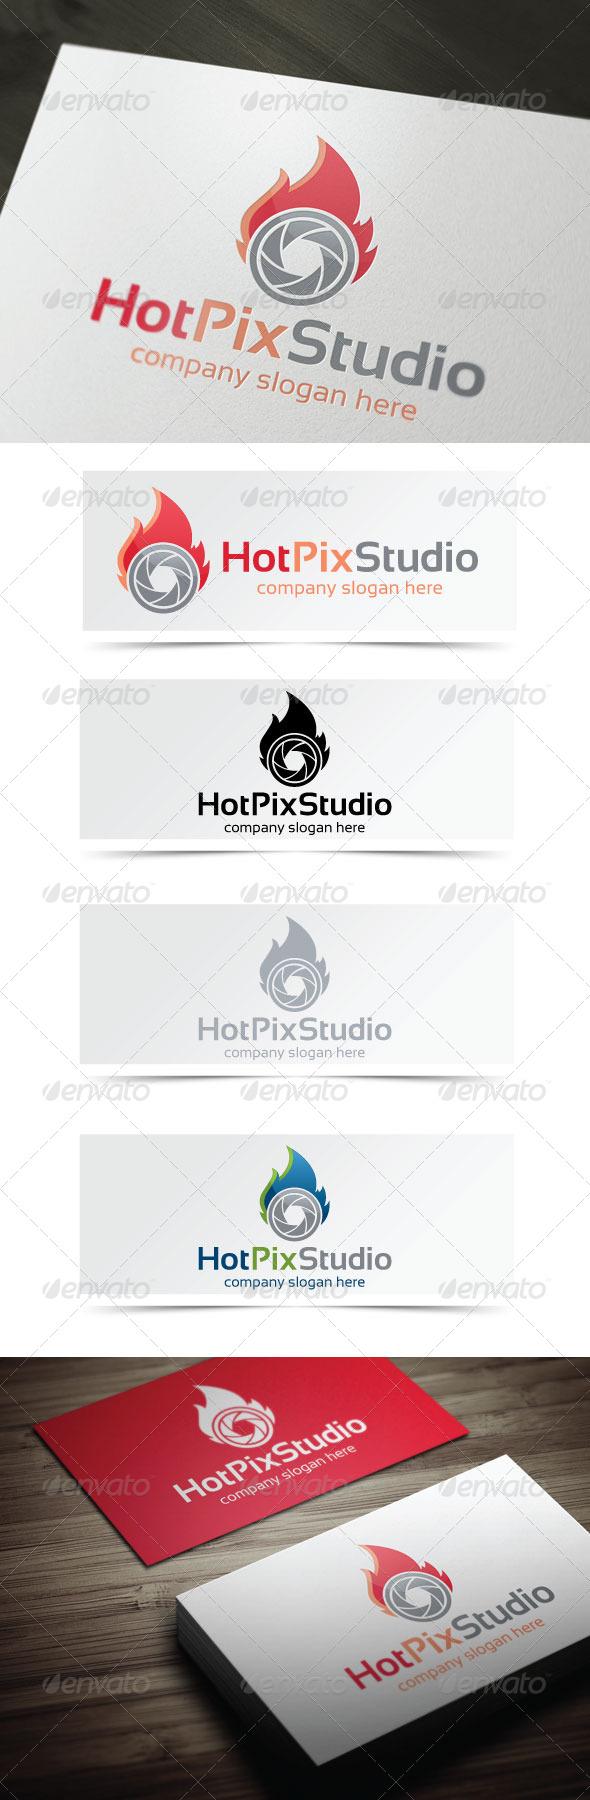 Hot Pix Studio